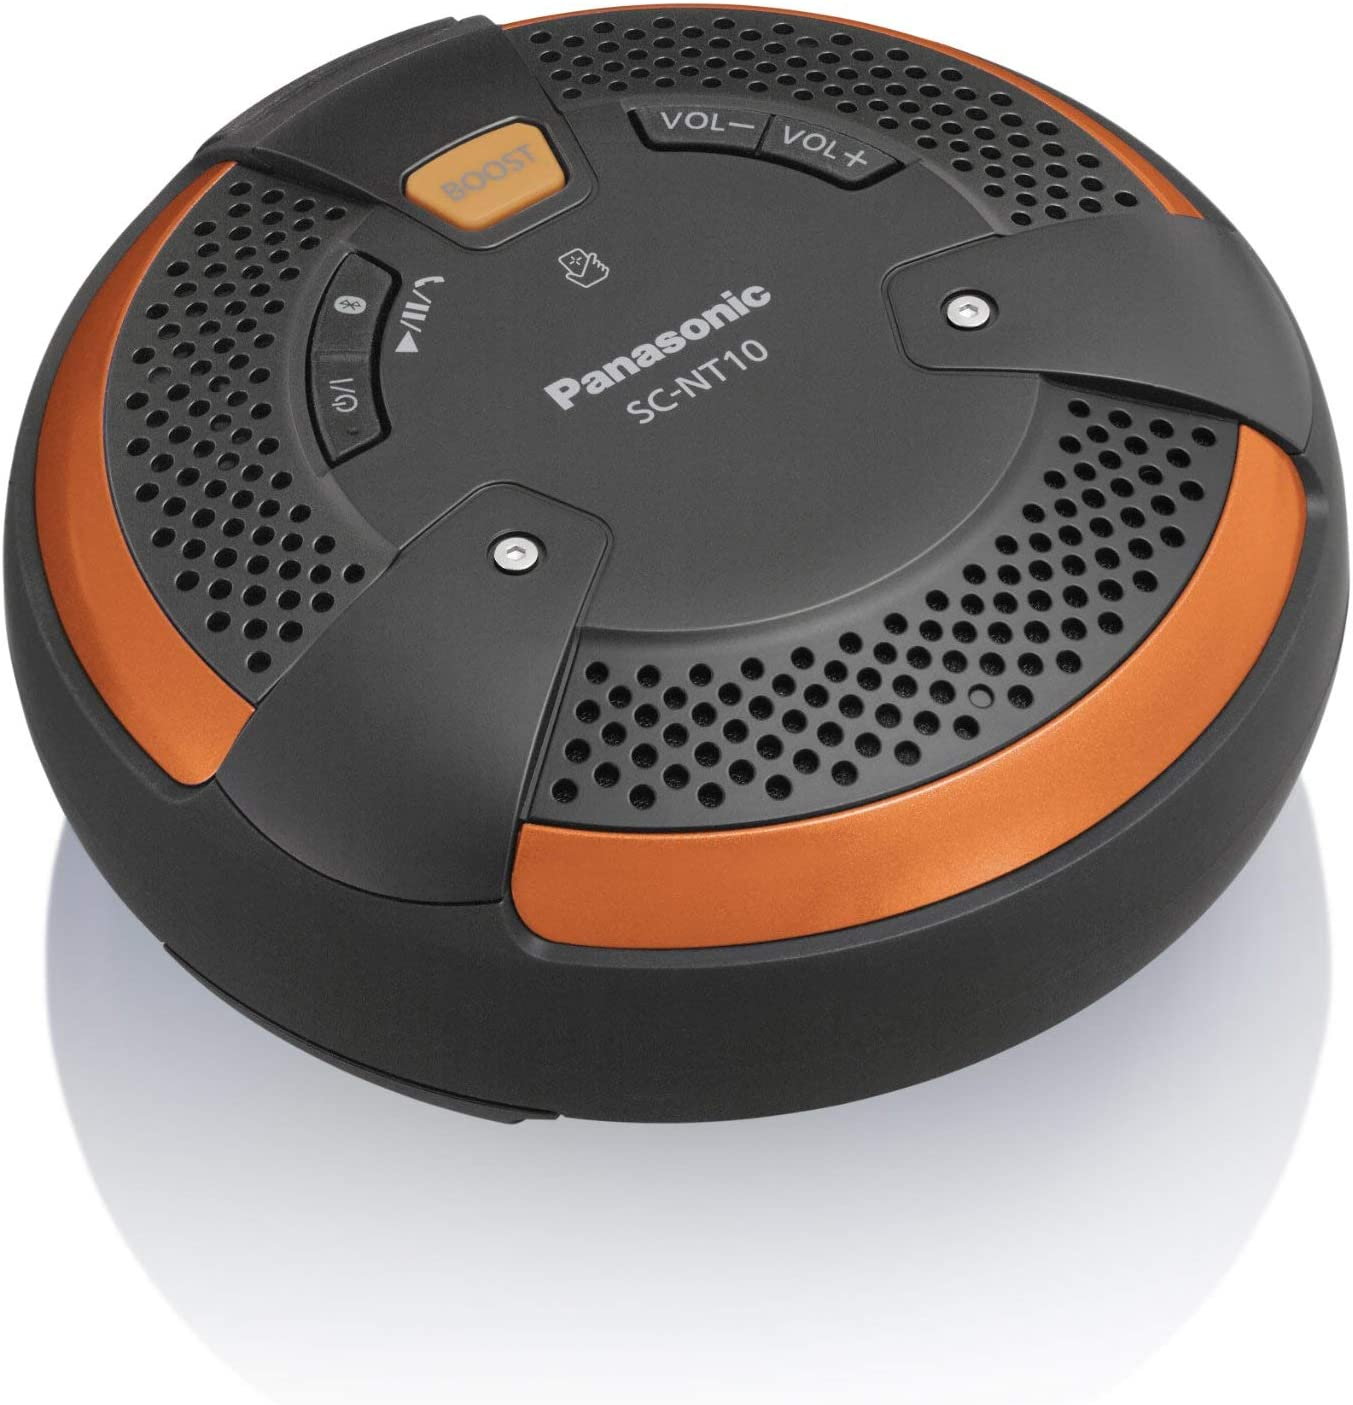 Panasonic SC-NT10-D TOUGH BlueTooth Portable Wireless Speaker System